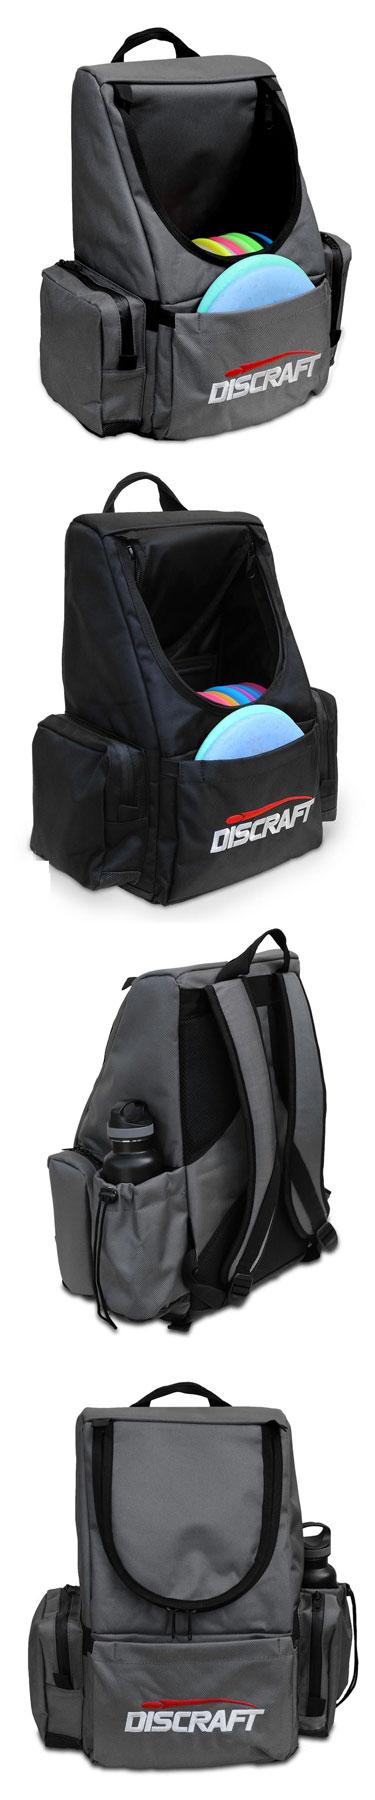 Discraft Tournament Backpack